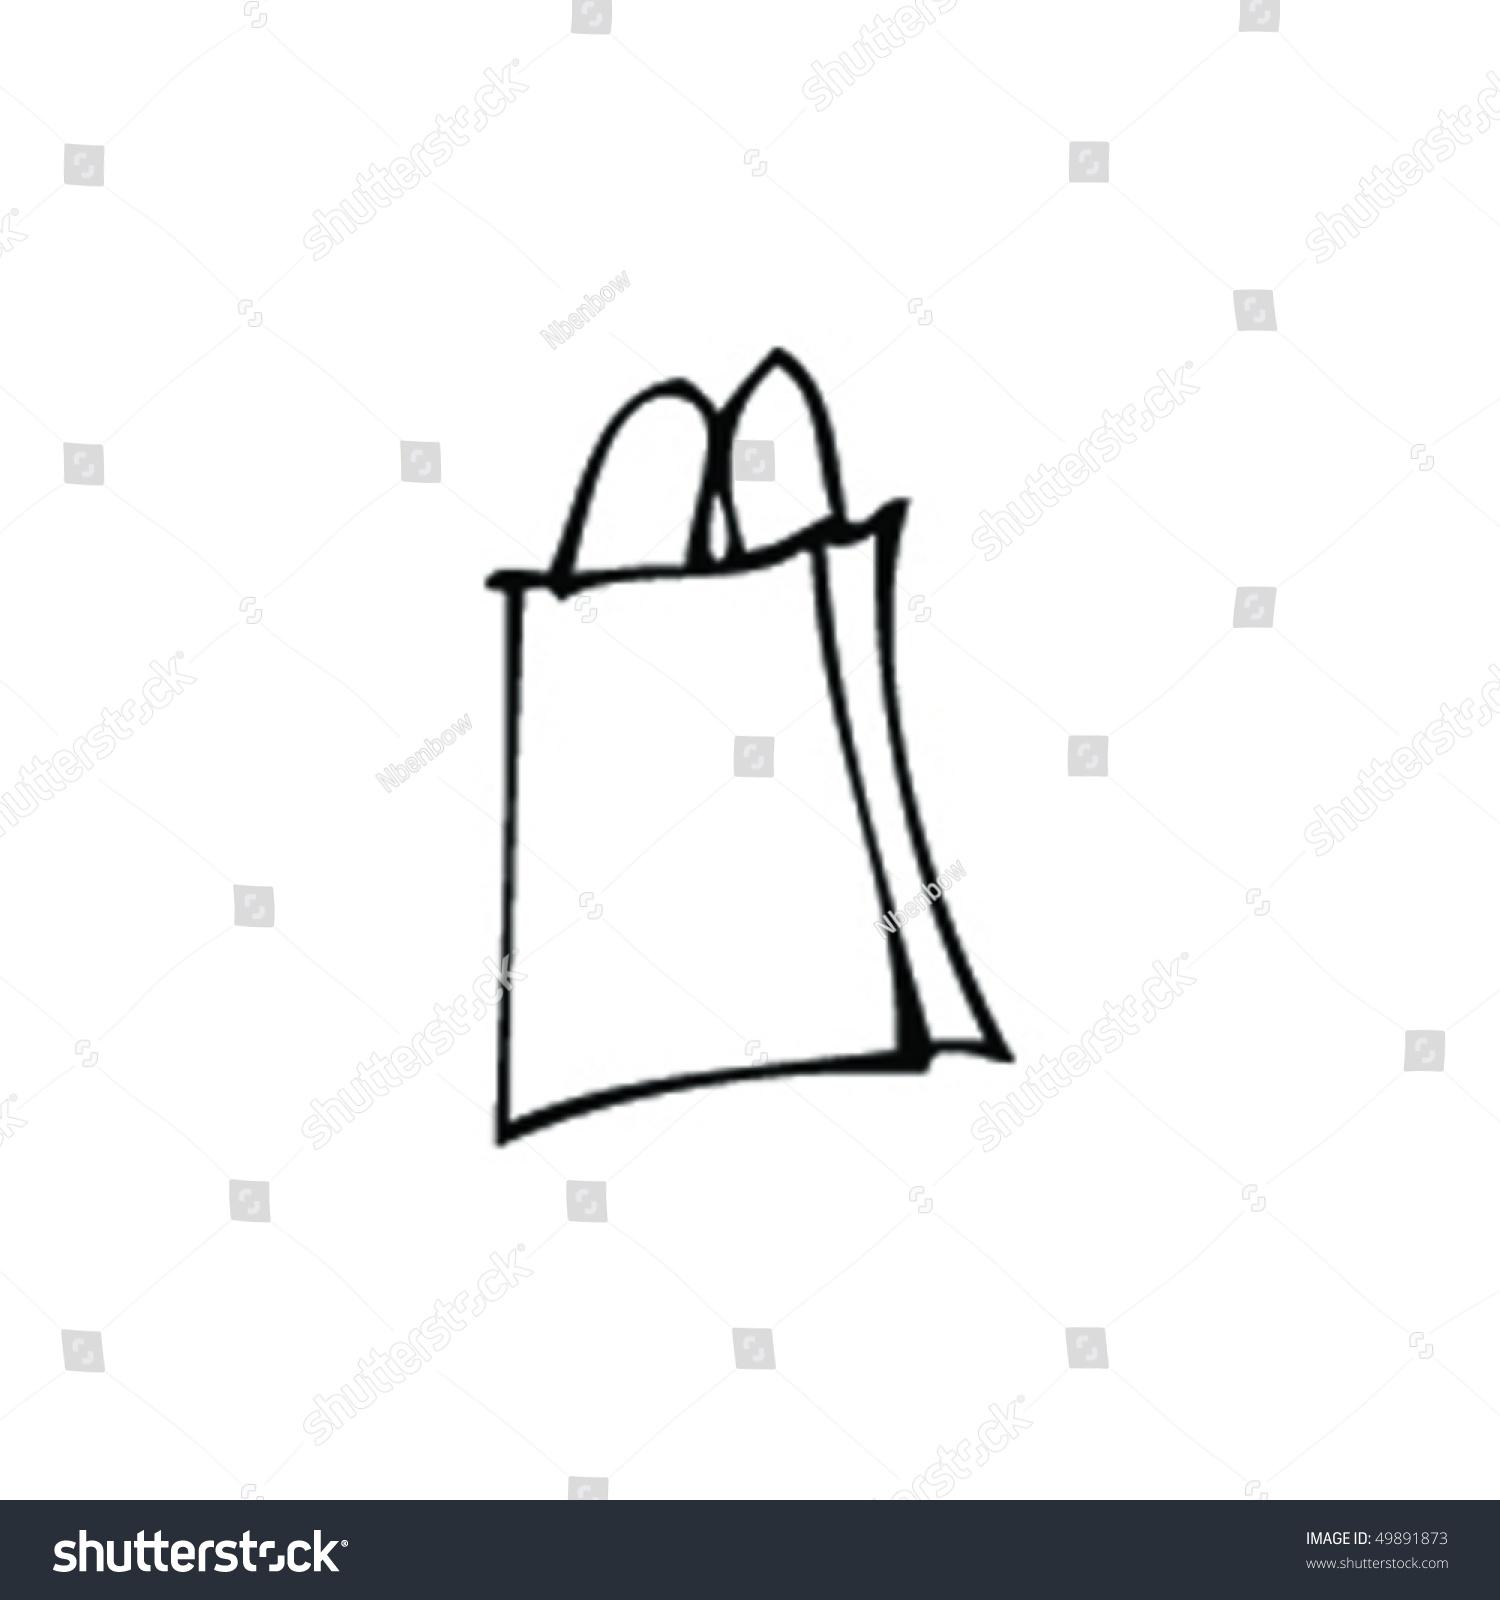 Paper bag sketch - Sketch Of A Shopping Bag